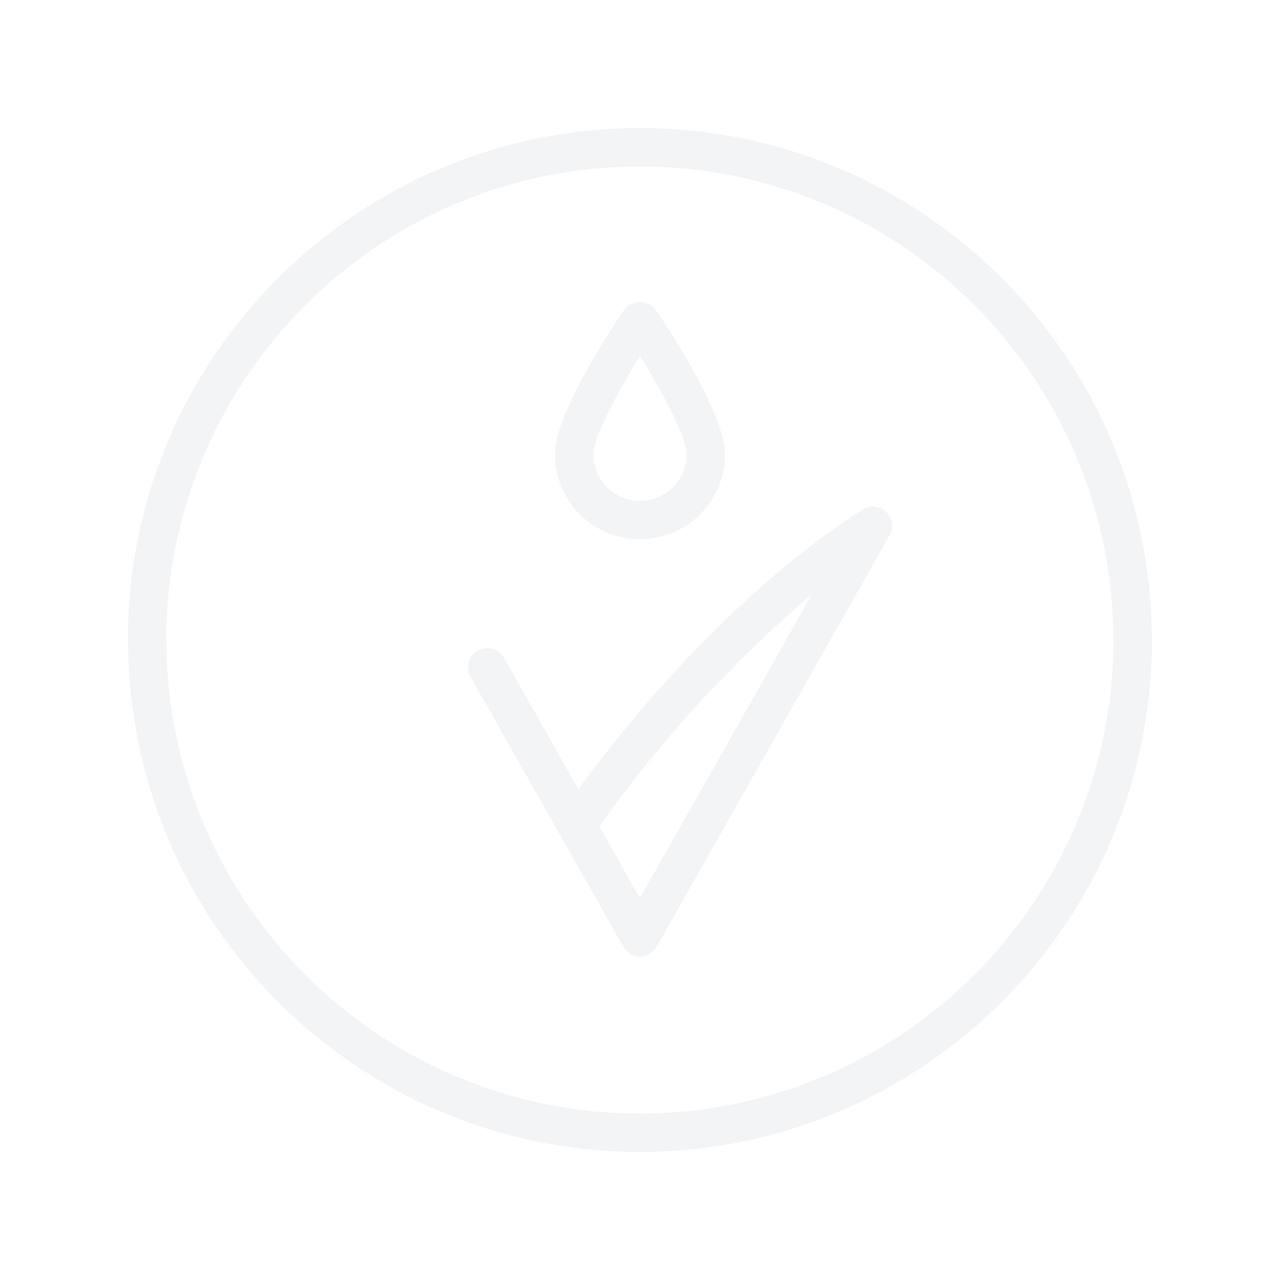 LA ROCHE-POSAY Effaclar Duo + Treatment 40ml